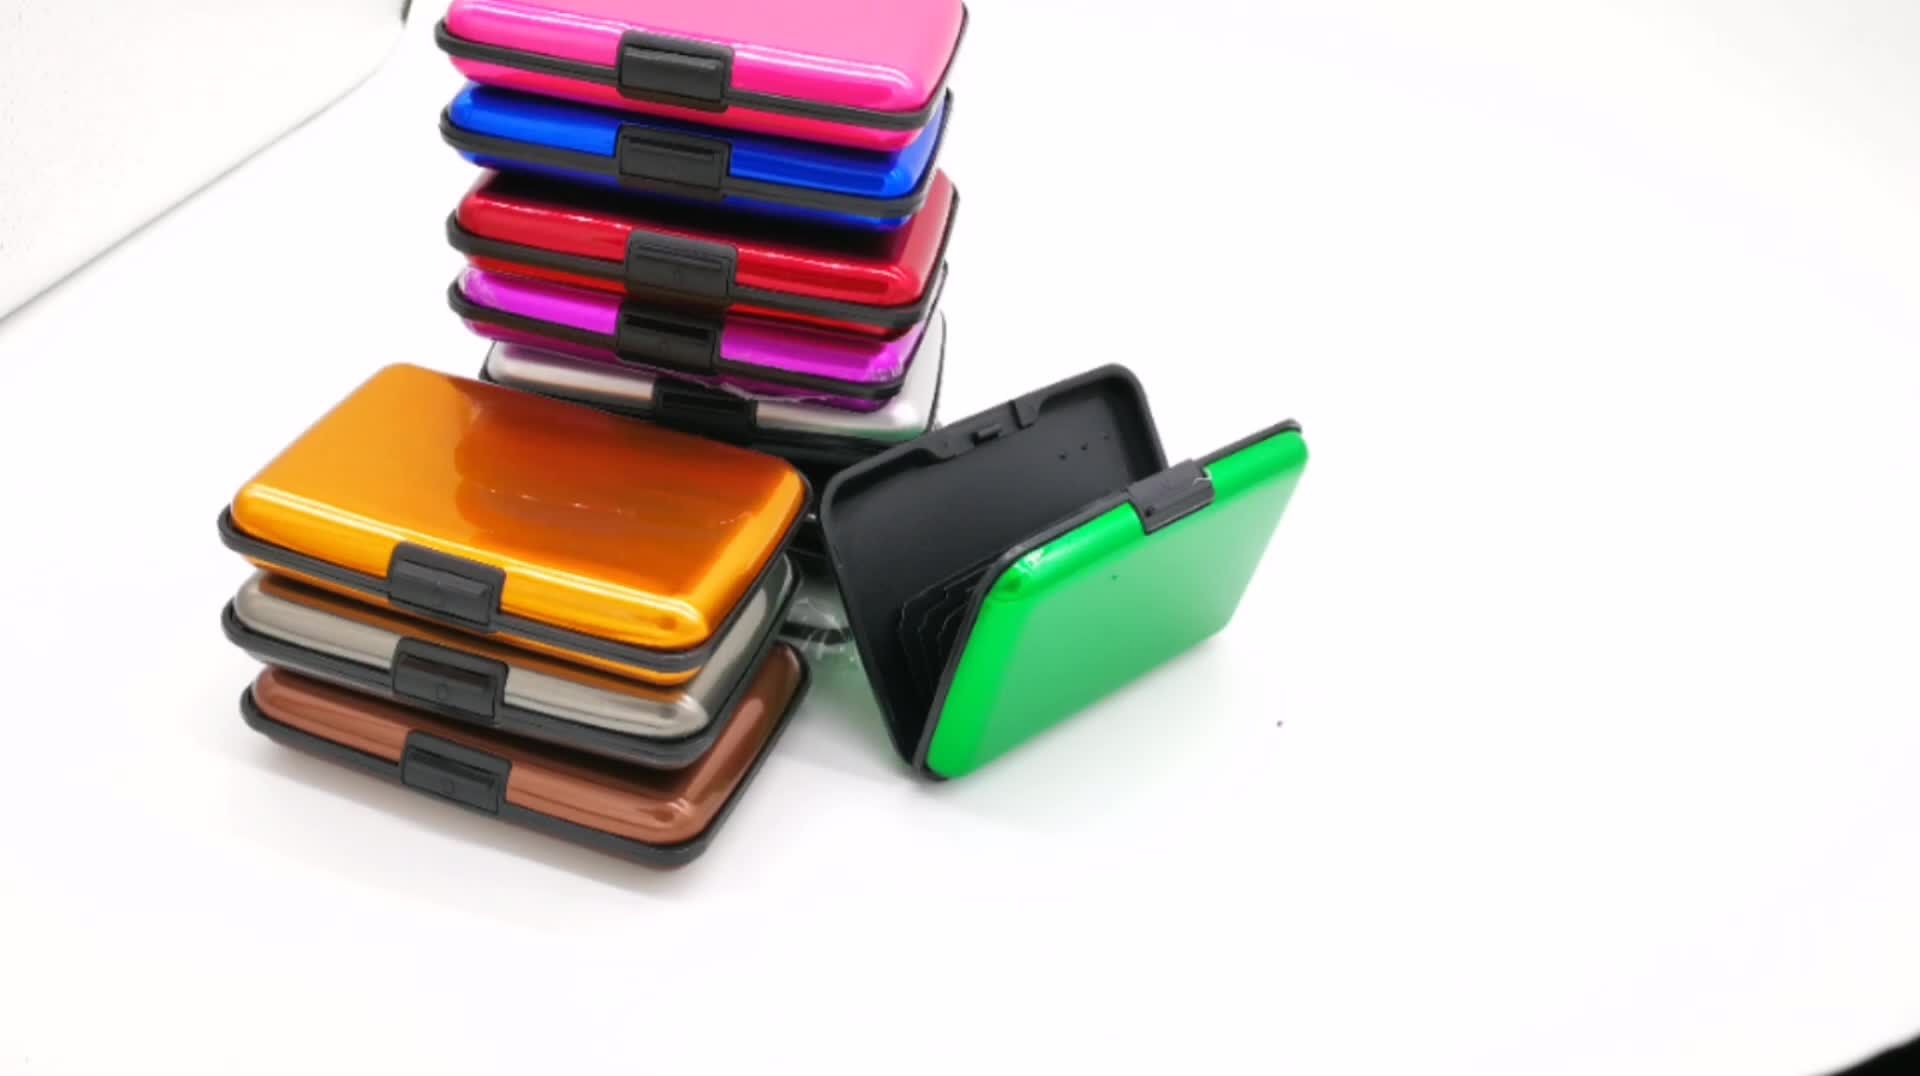 MOQ kecil RFID Memblokir waterproof id bisnis kartu kredit dompet pemegang